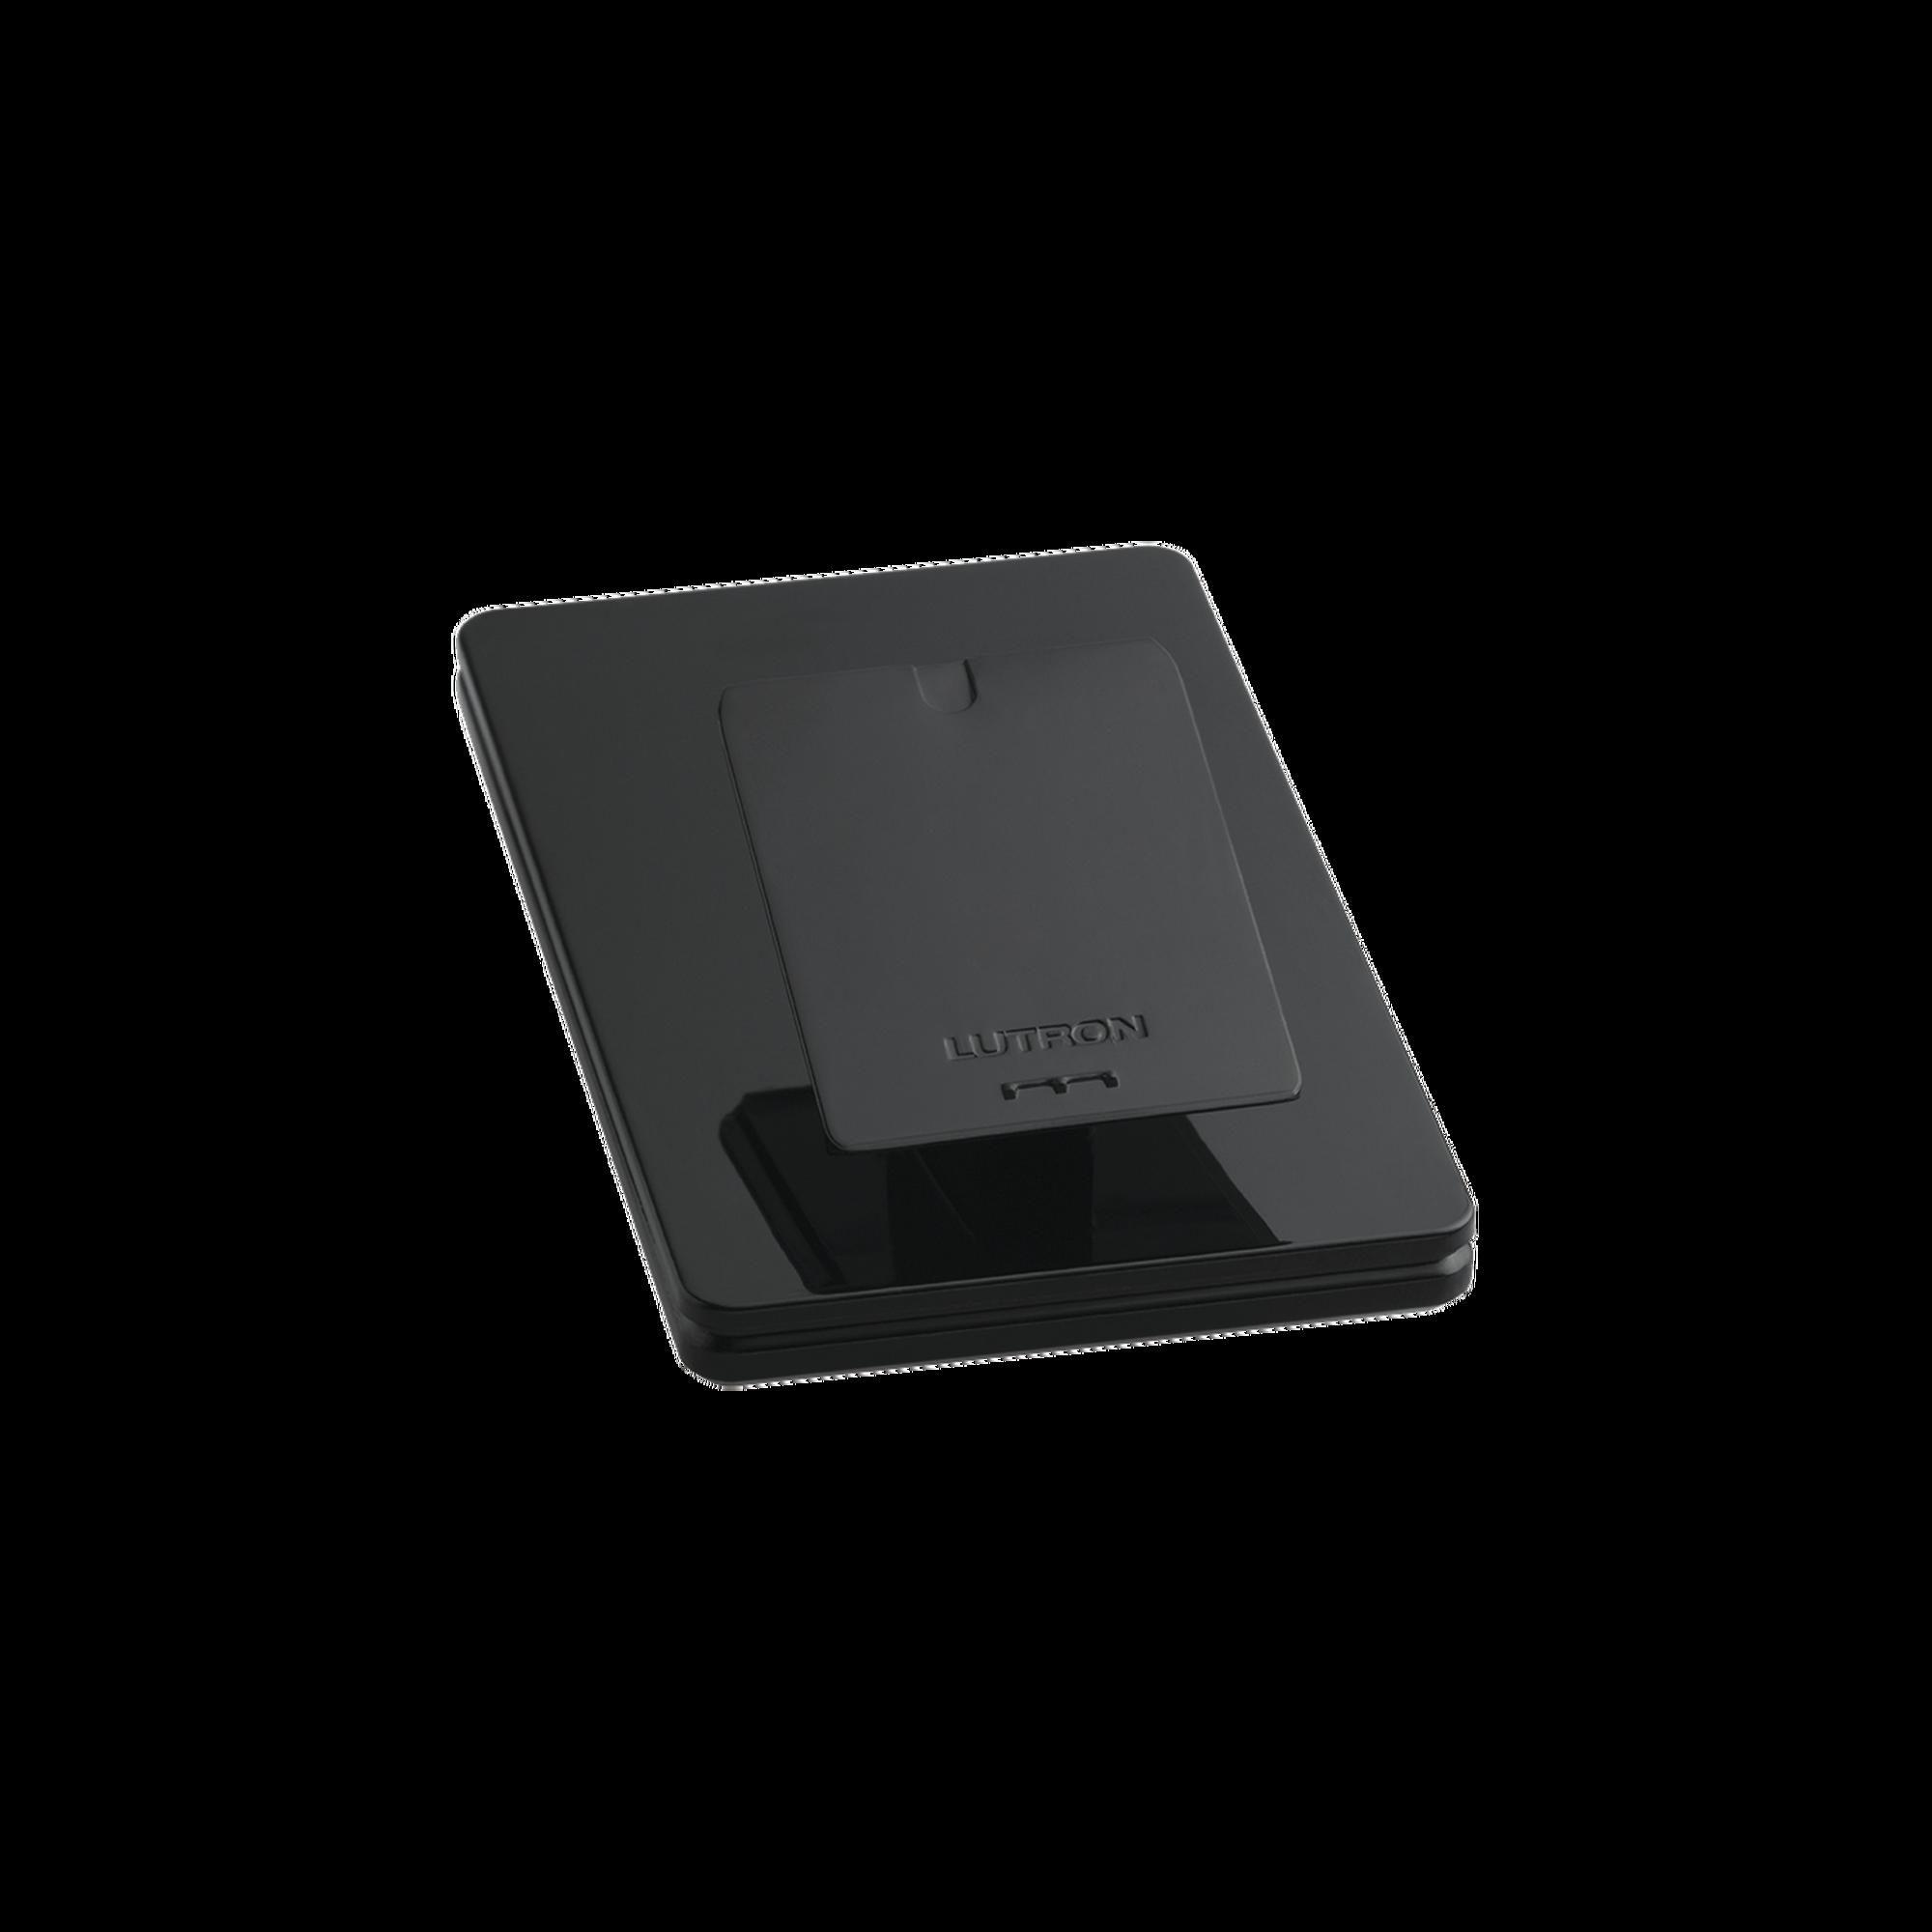 Base de mesa para un control remoto inalámbrico LUTRON. Con goma para evitar deslizamiento.